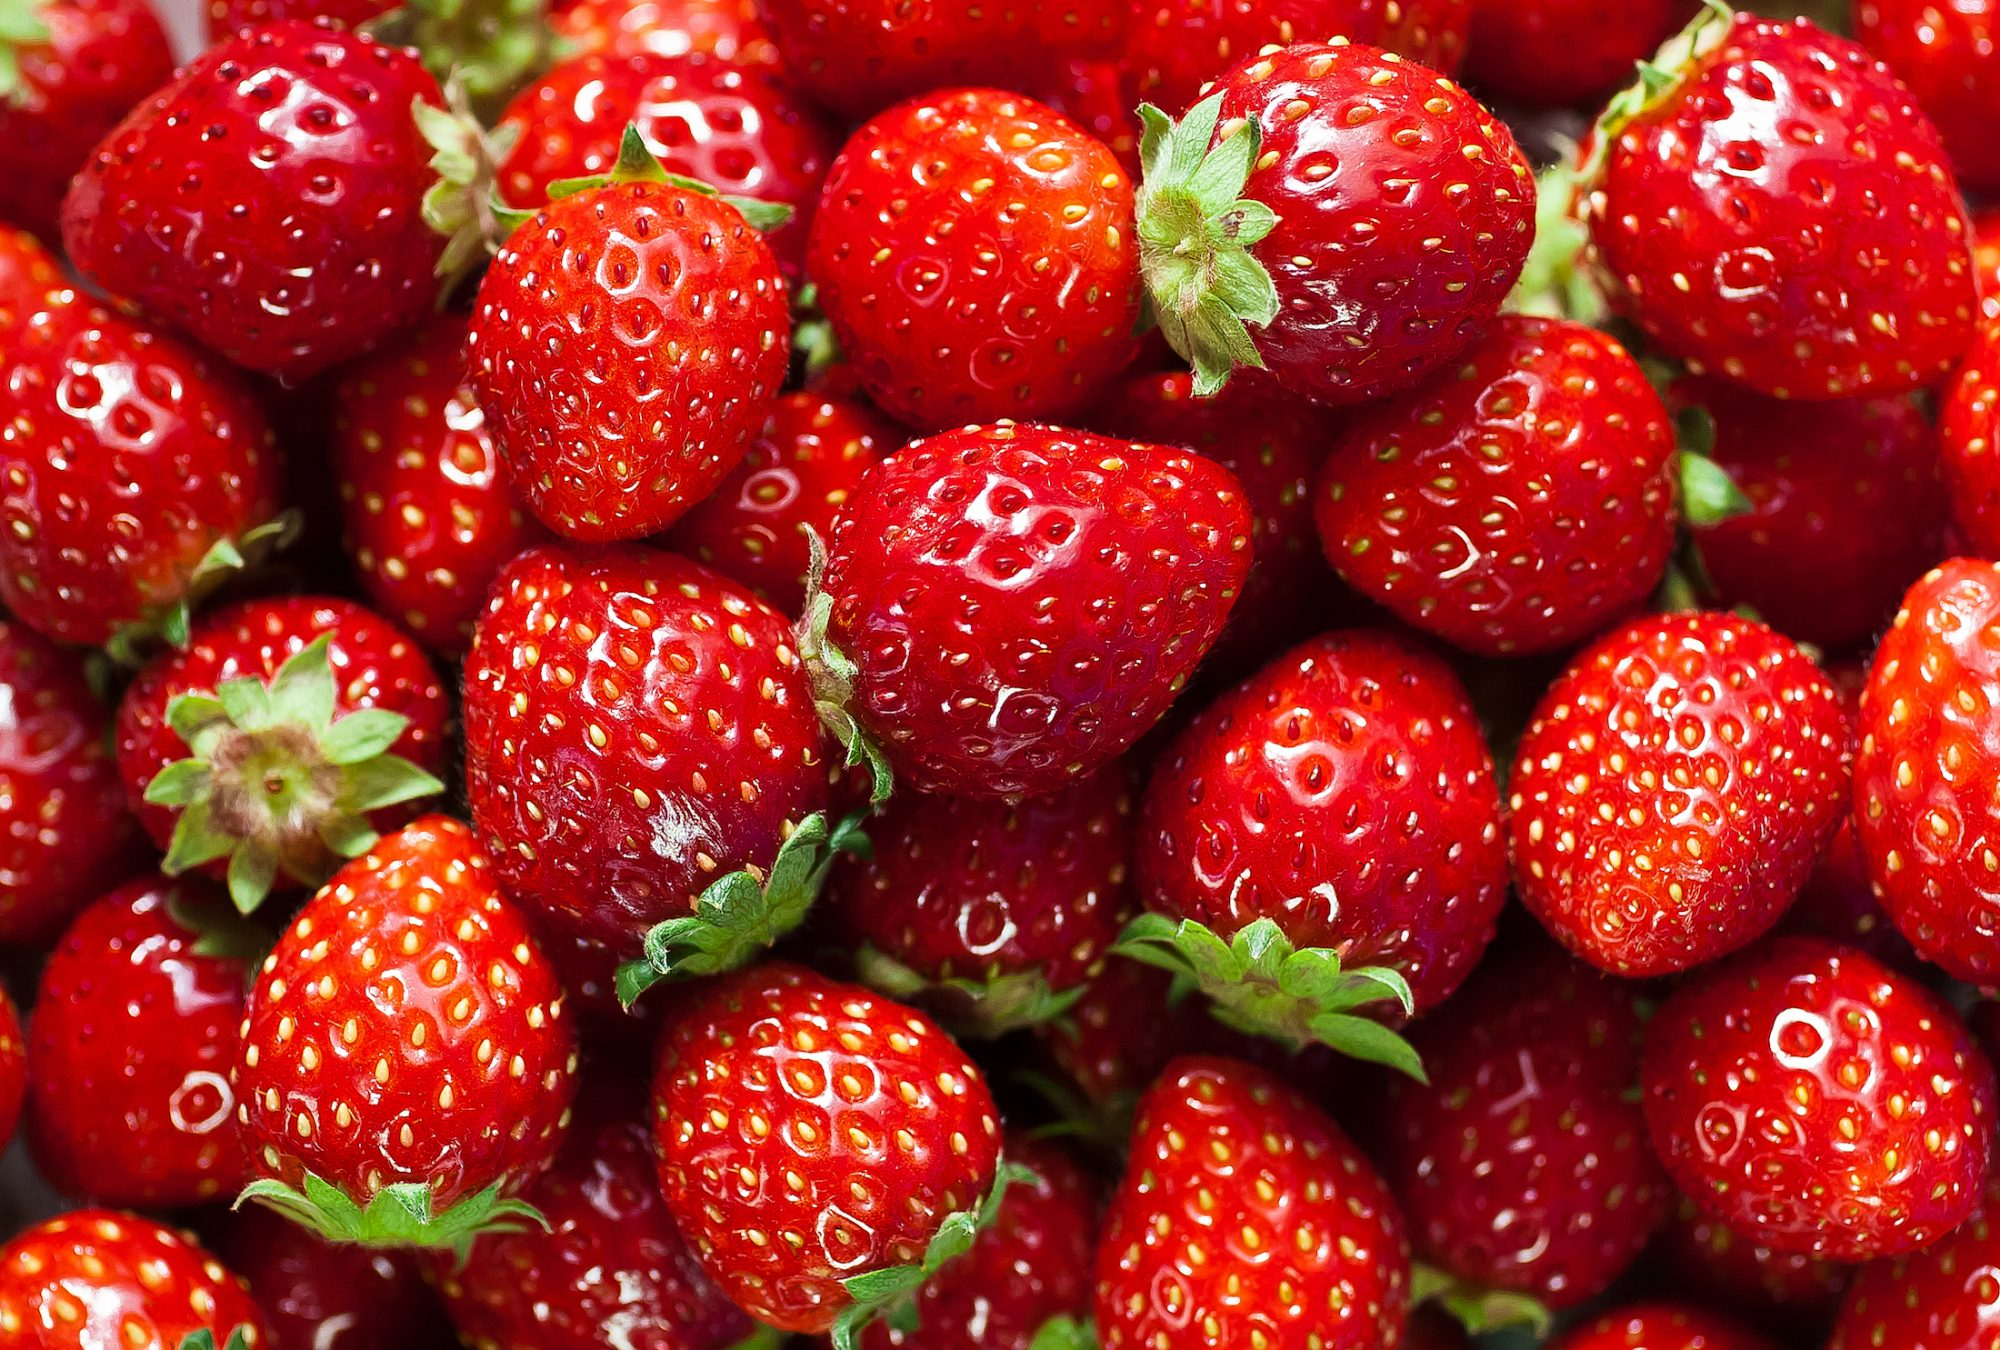 gettystrawberry.jpg